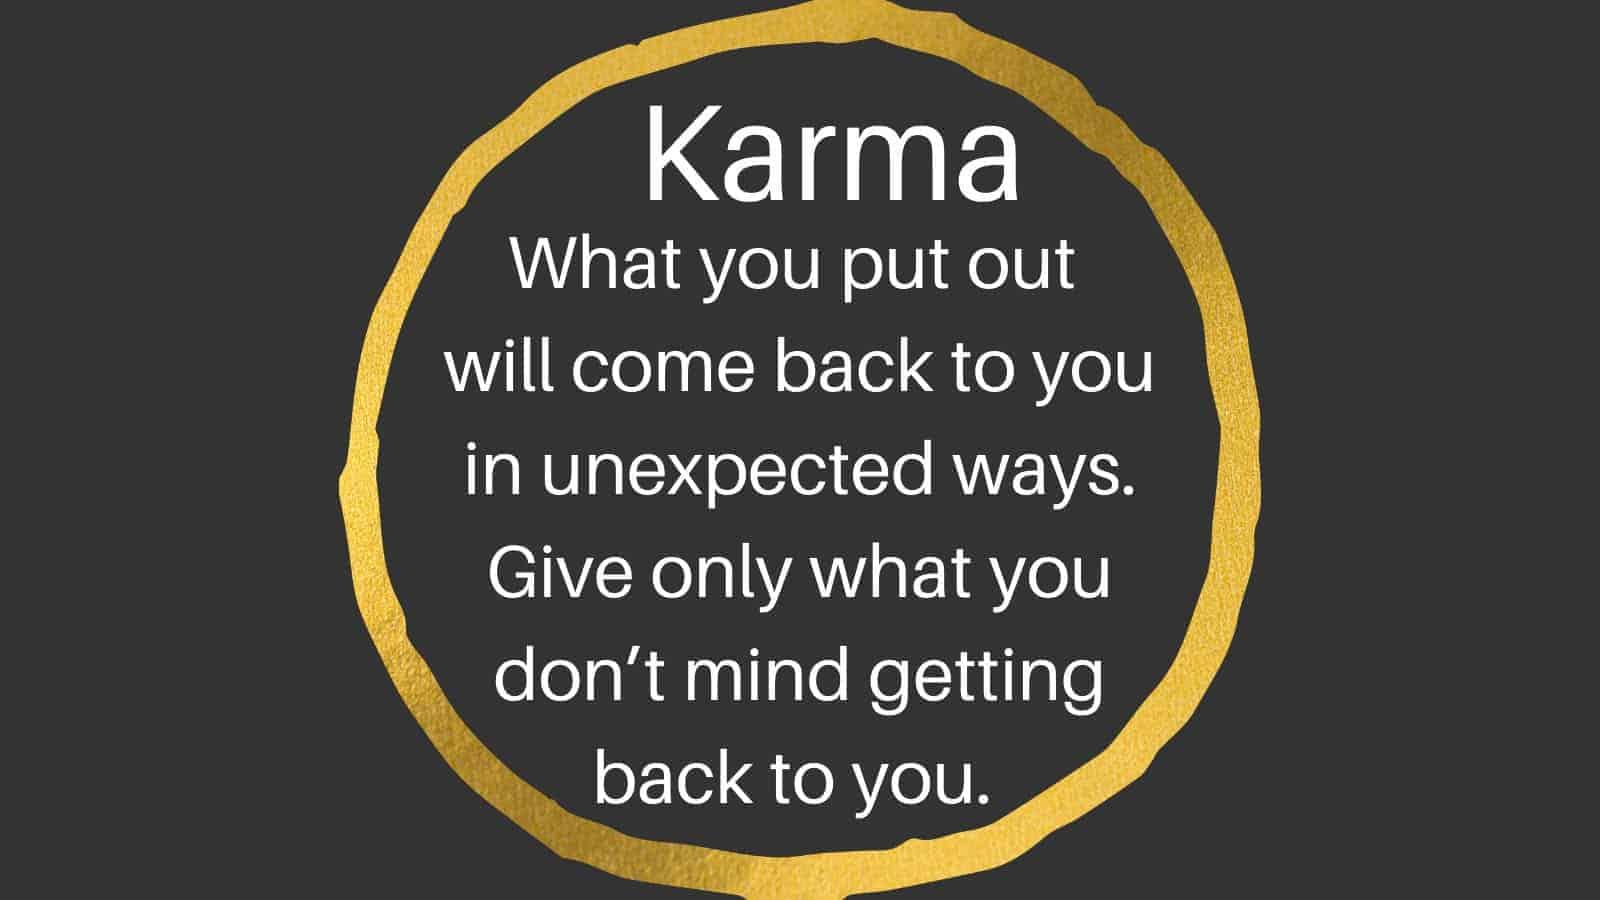 6 Ways to Create Good Karma | Power of Positivity